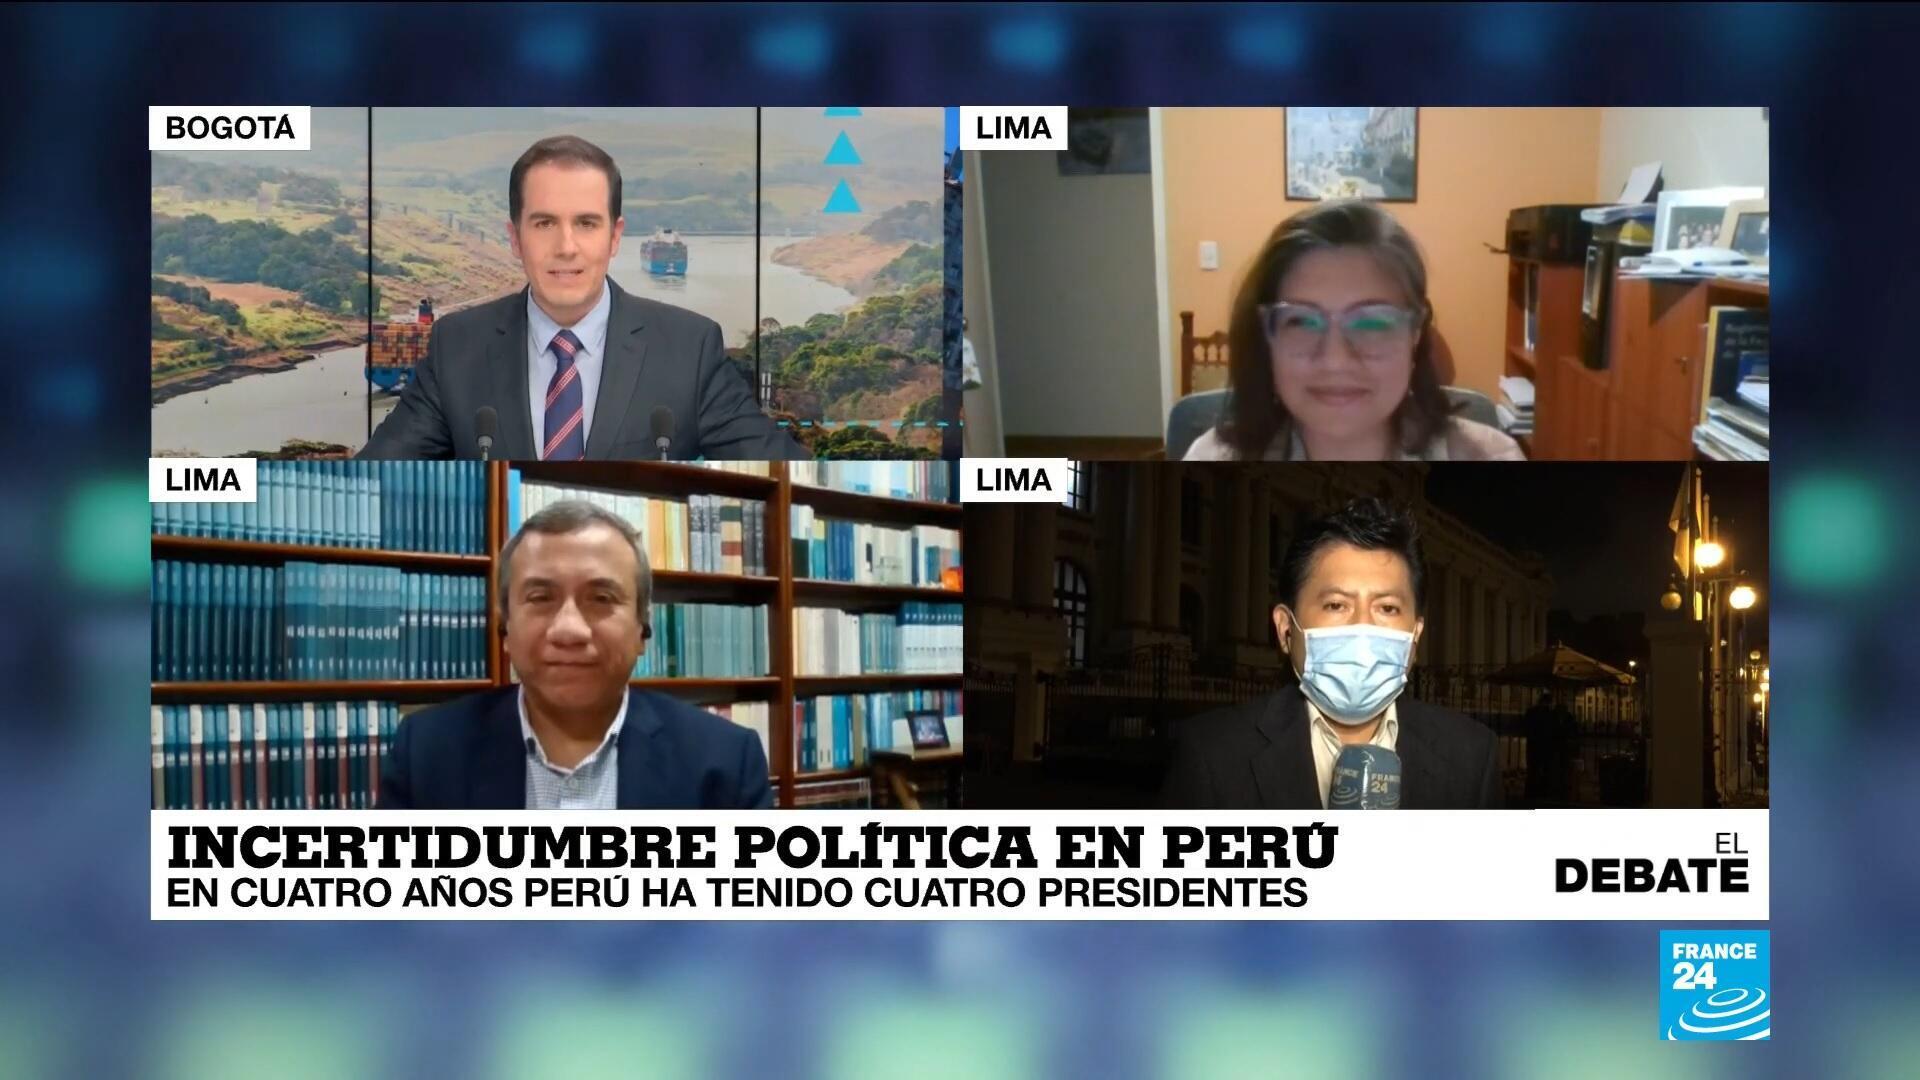 el debate - incertidumbre política Perú